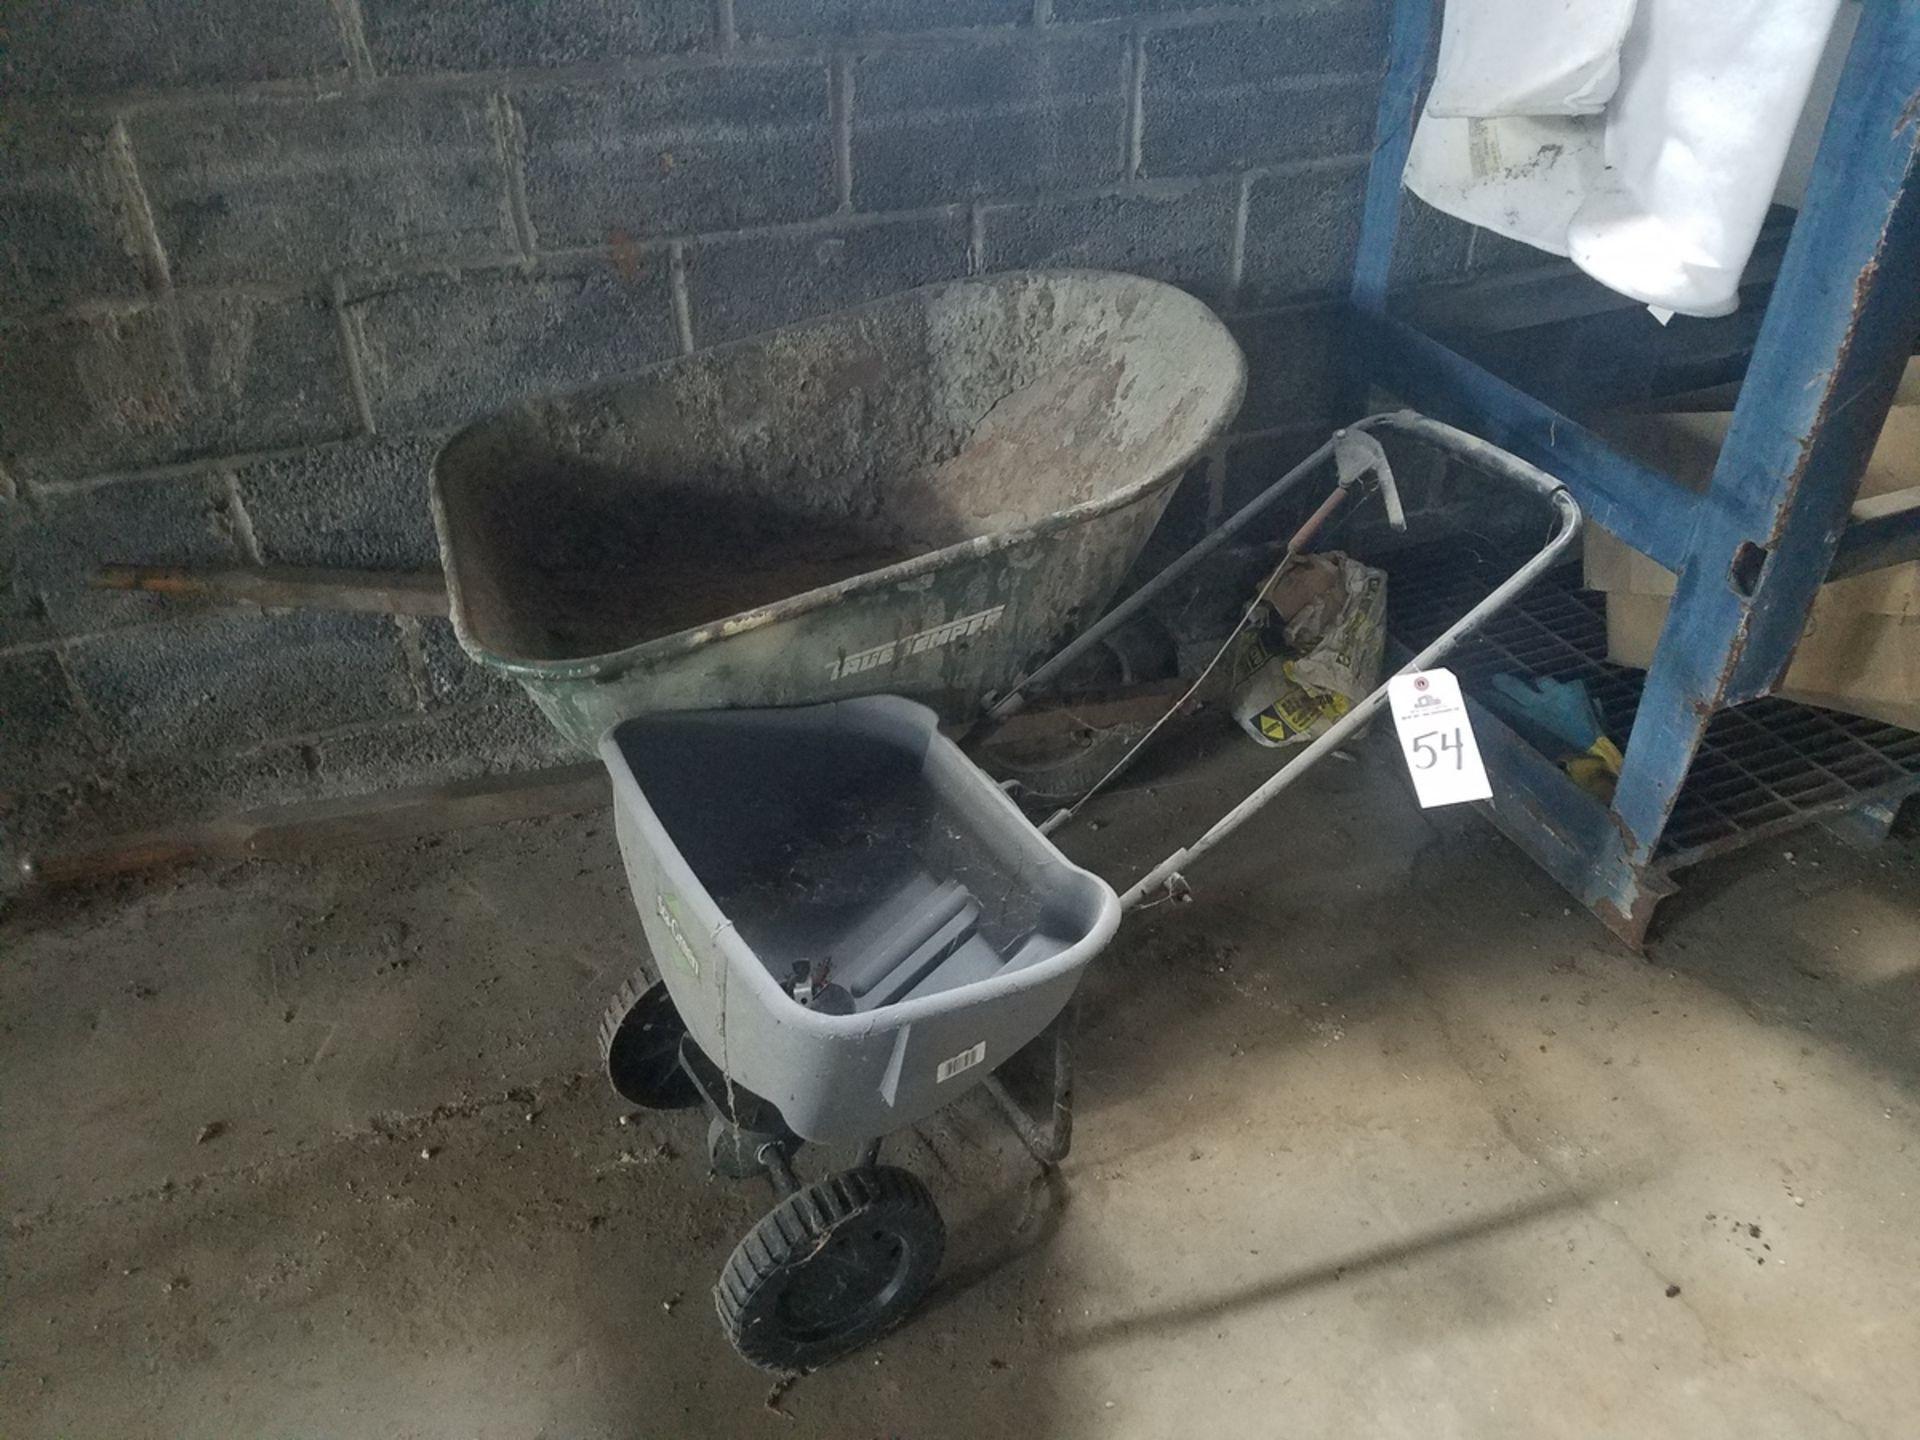 Wheel Barrow & Seeder   Rig Fee: $25